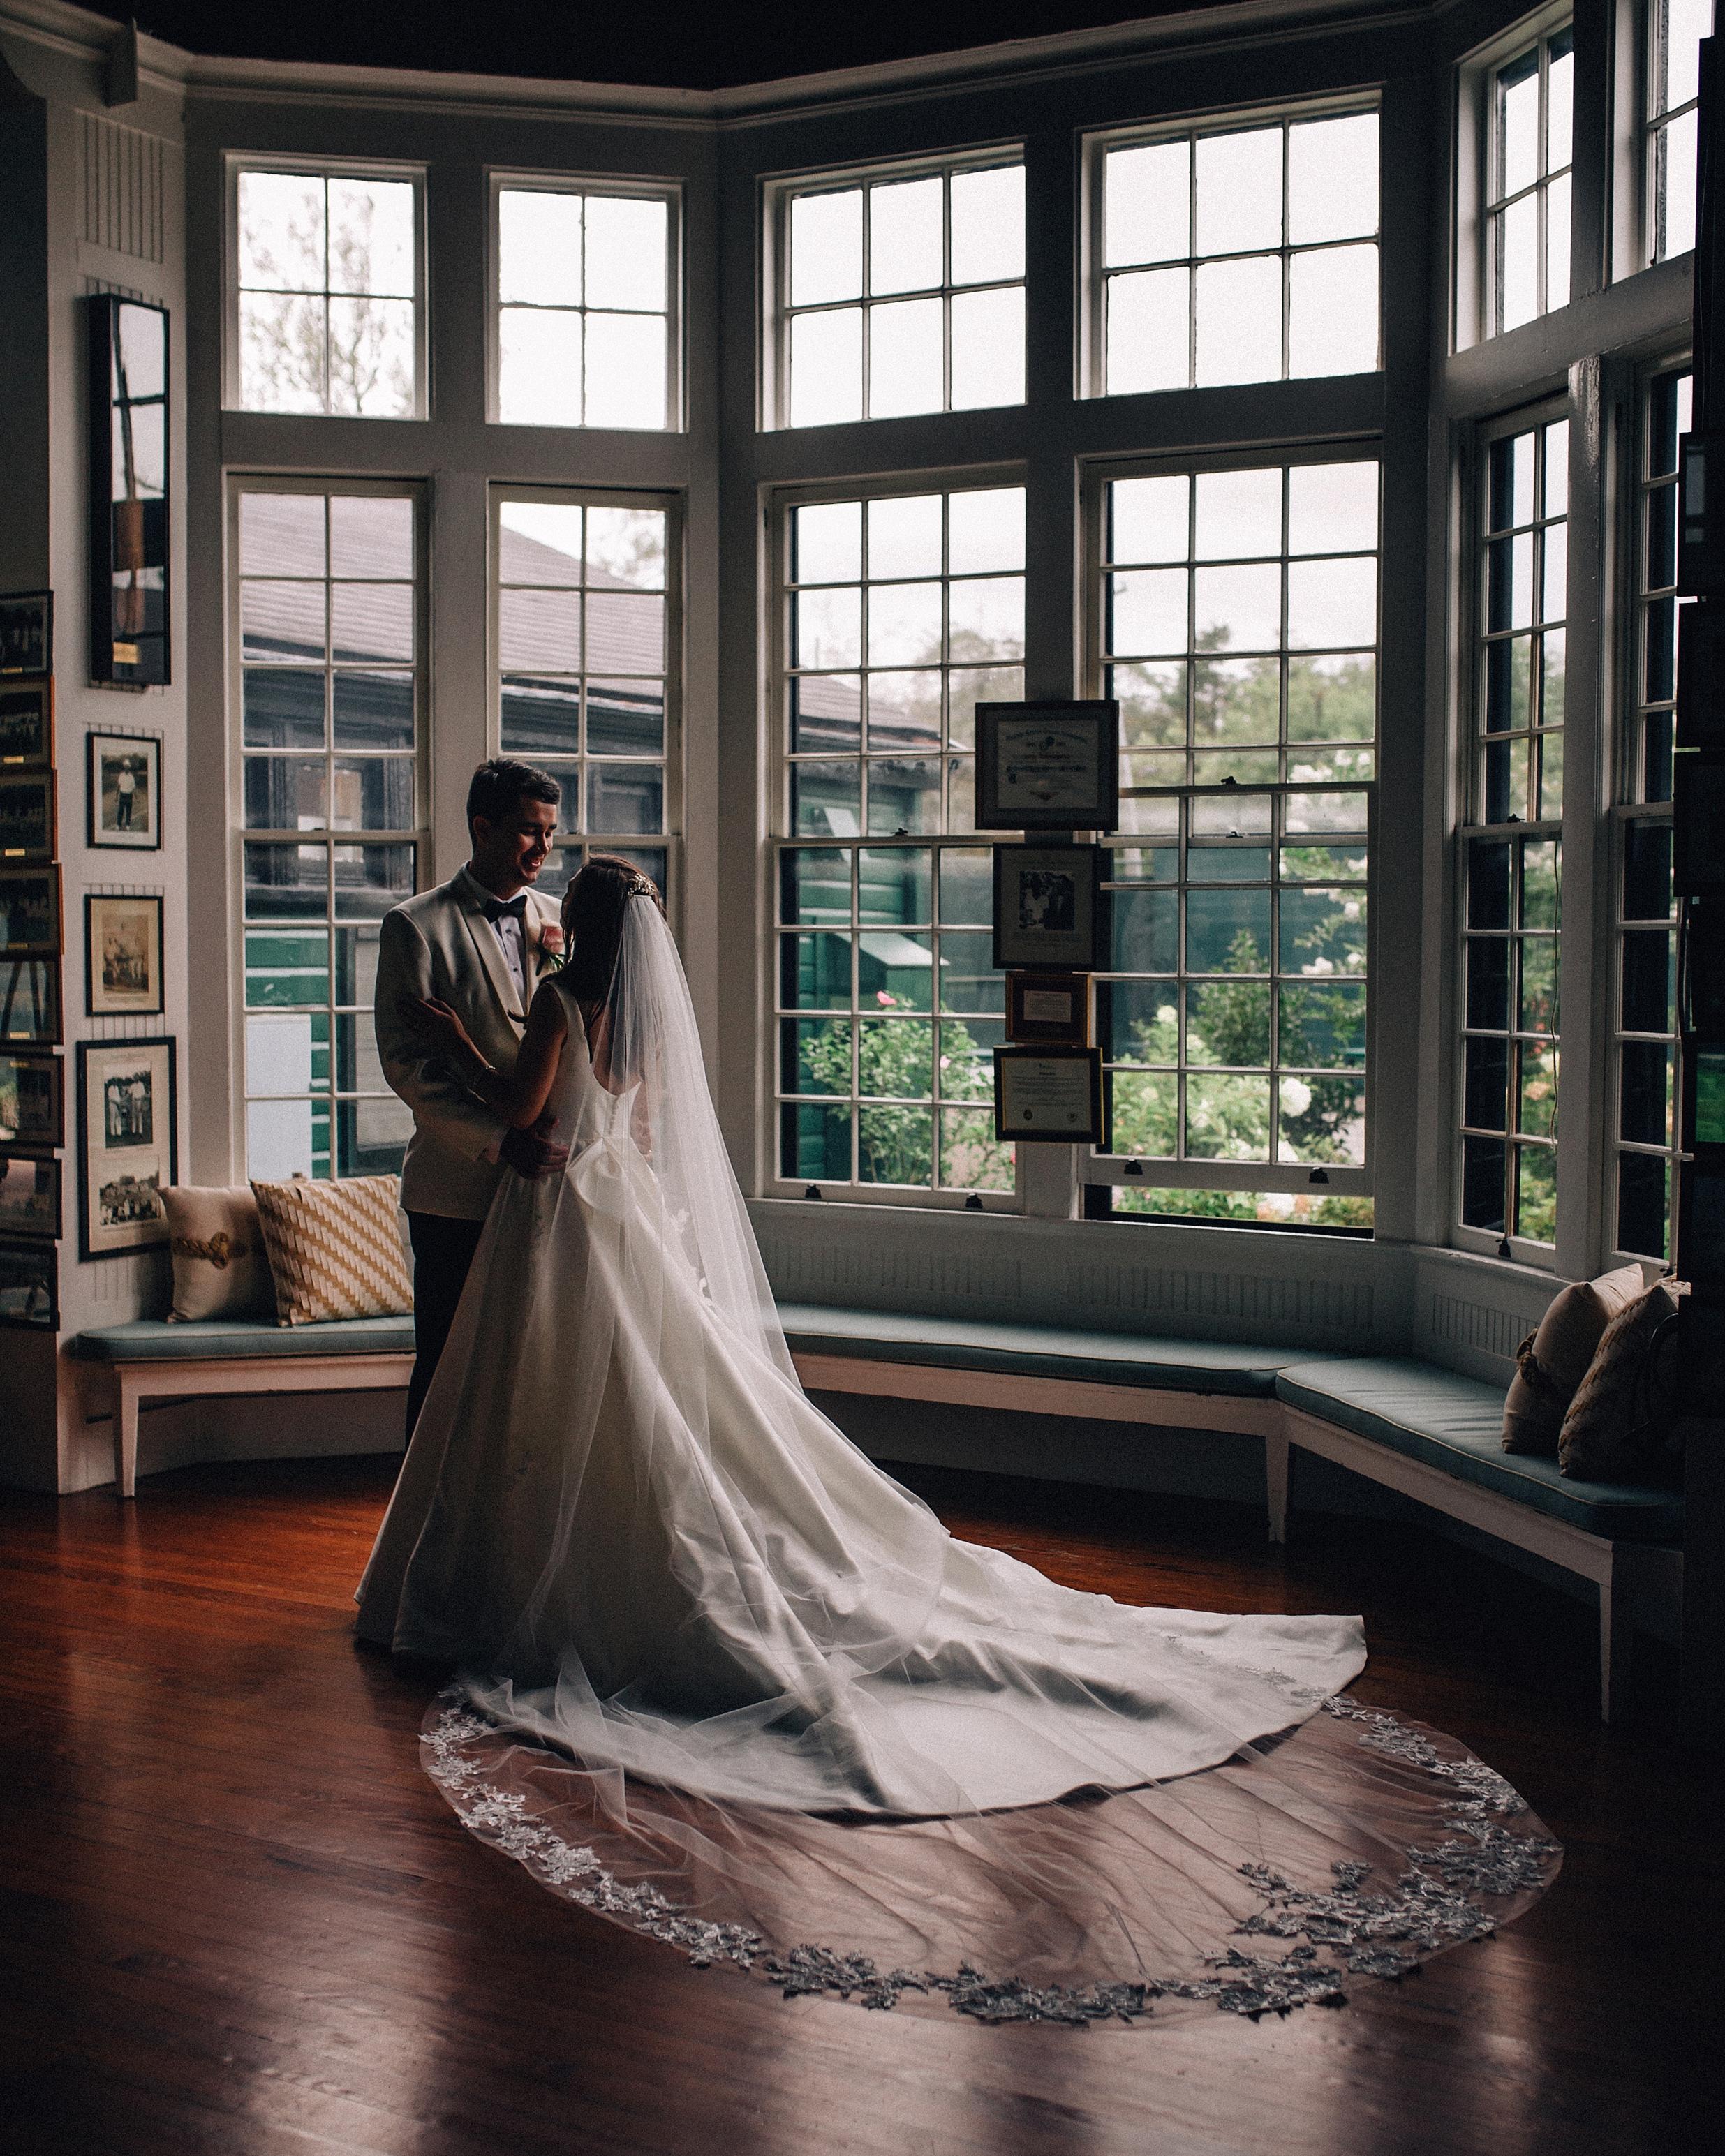 rumson-tented-wedding-nj-maine-conneticut-classic_0027.jpg